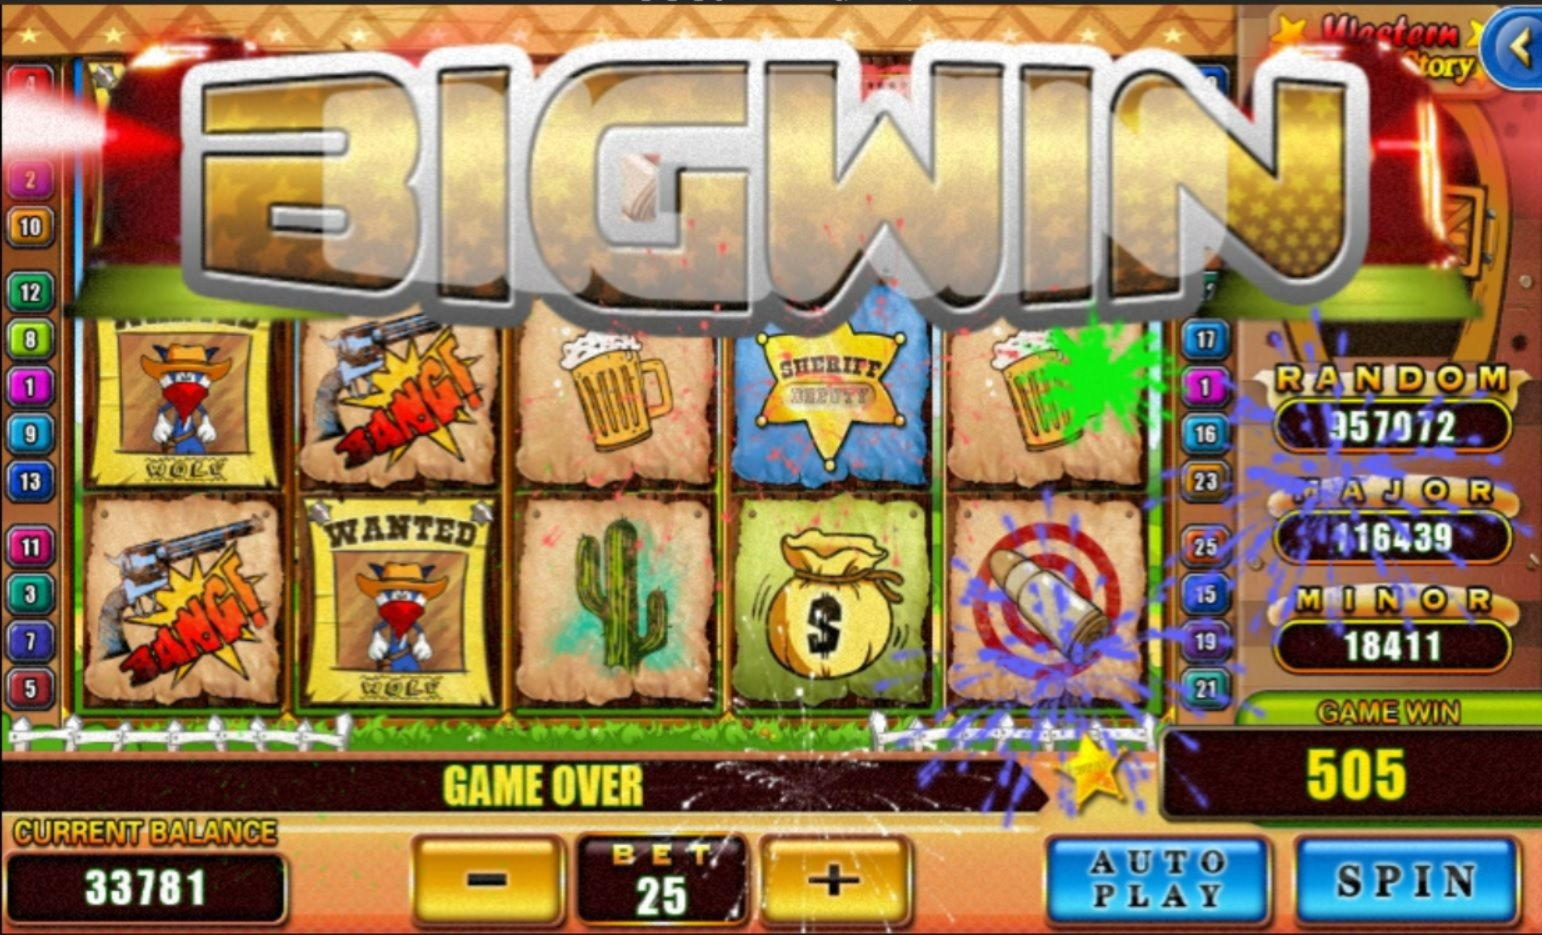 405% Signup Casino Bonus at Black Diamond Casino